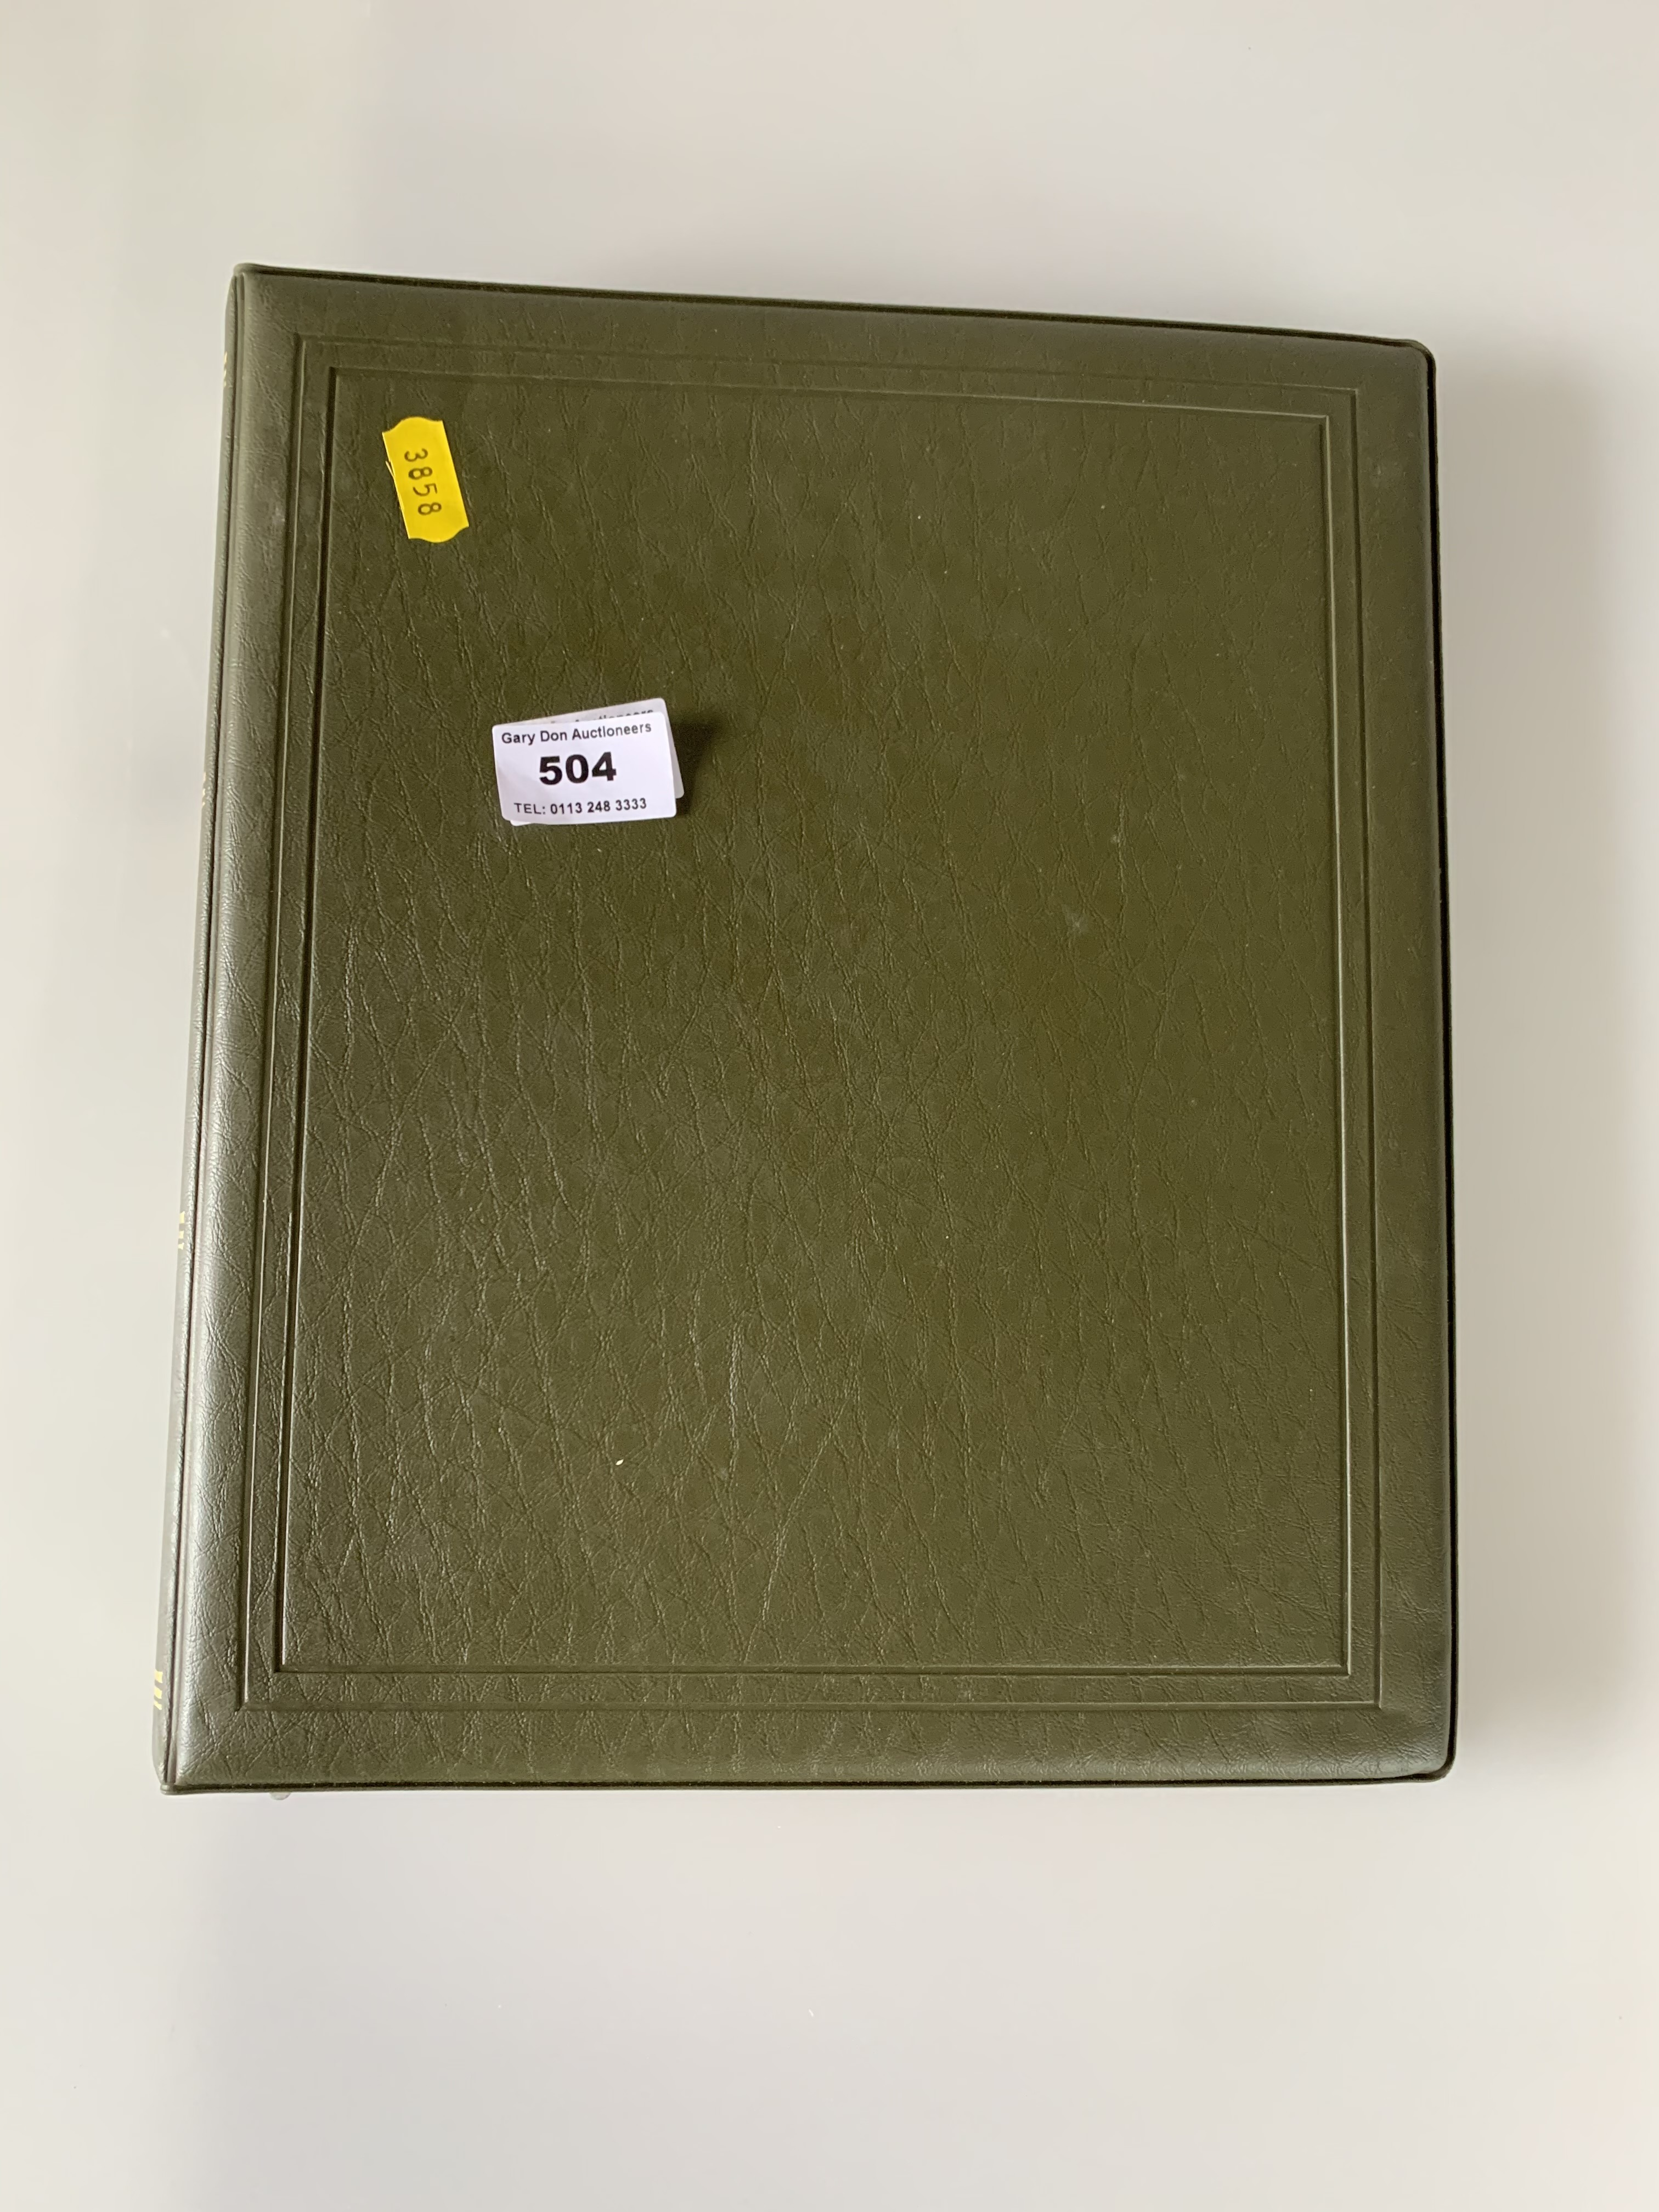 Green album of mint GB decimal stamps